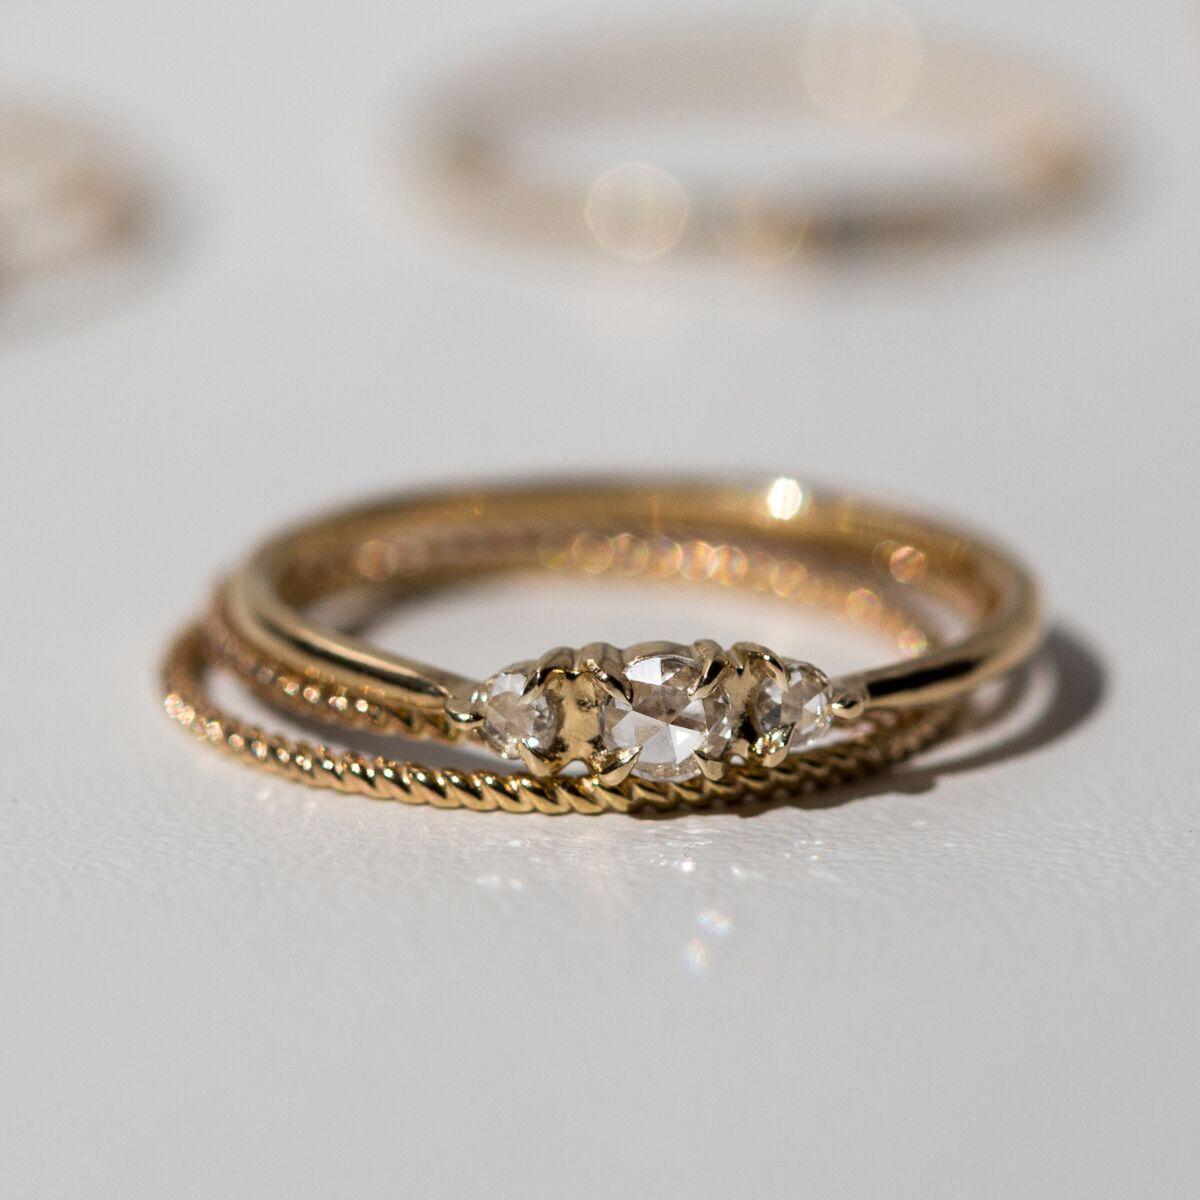 Sleeping Beauty Ring image